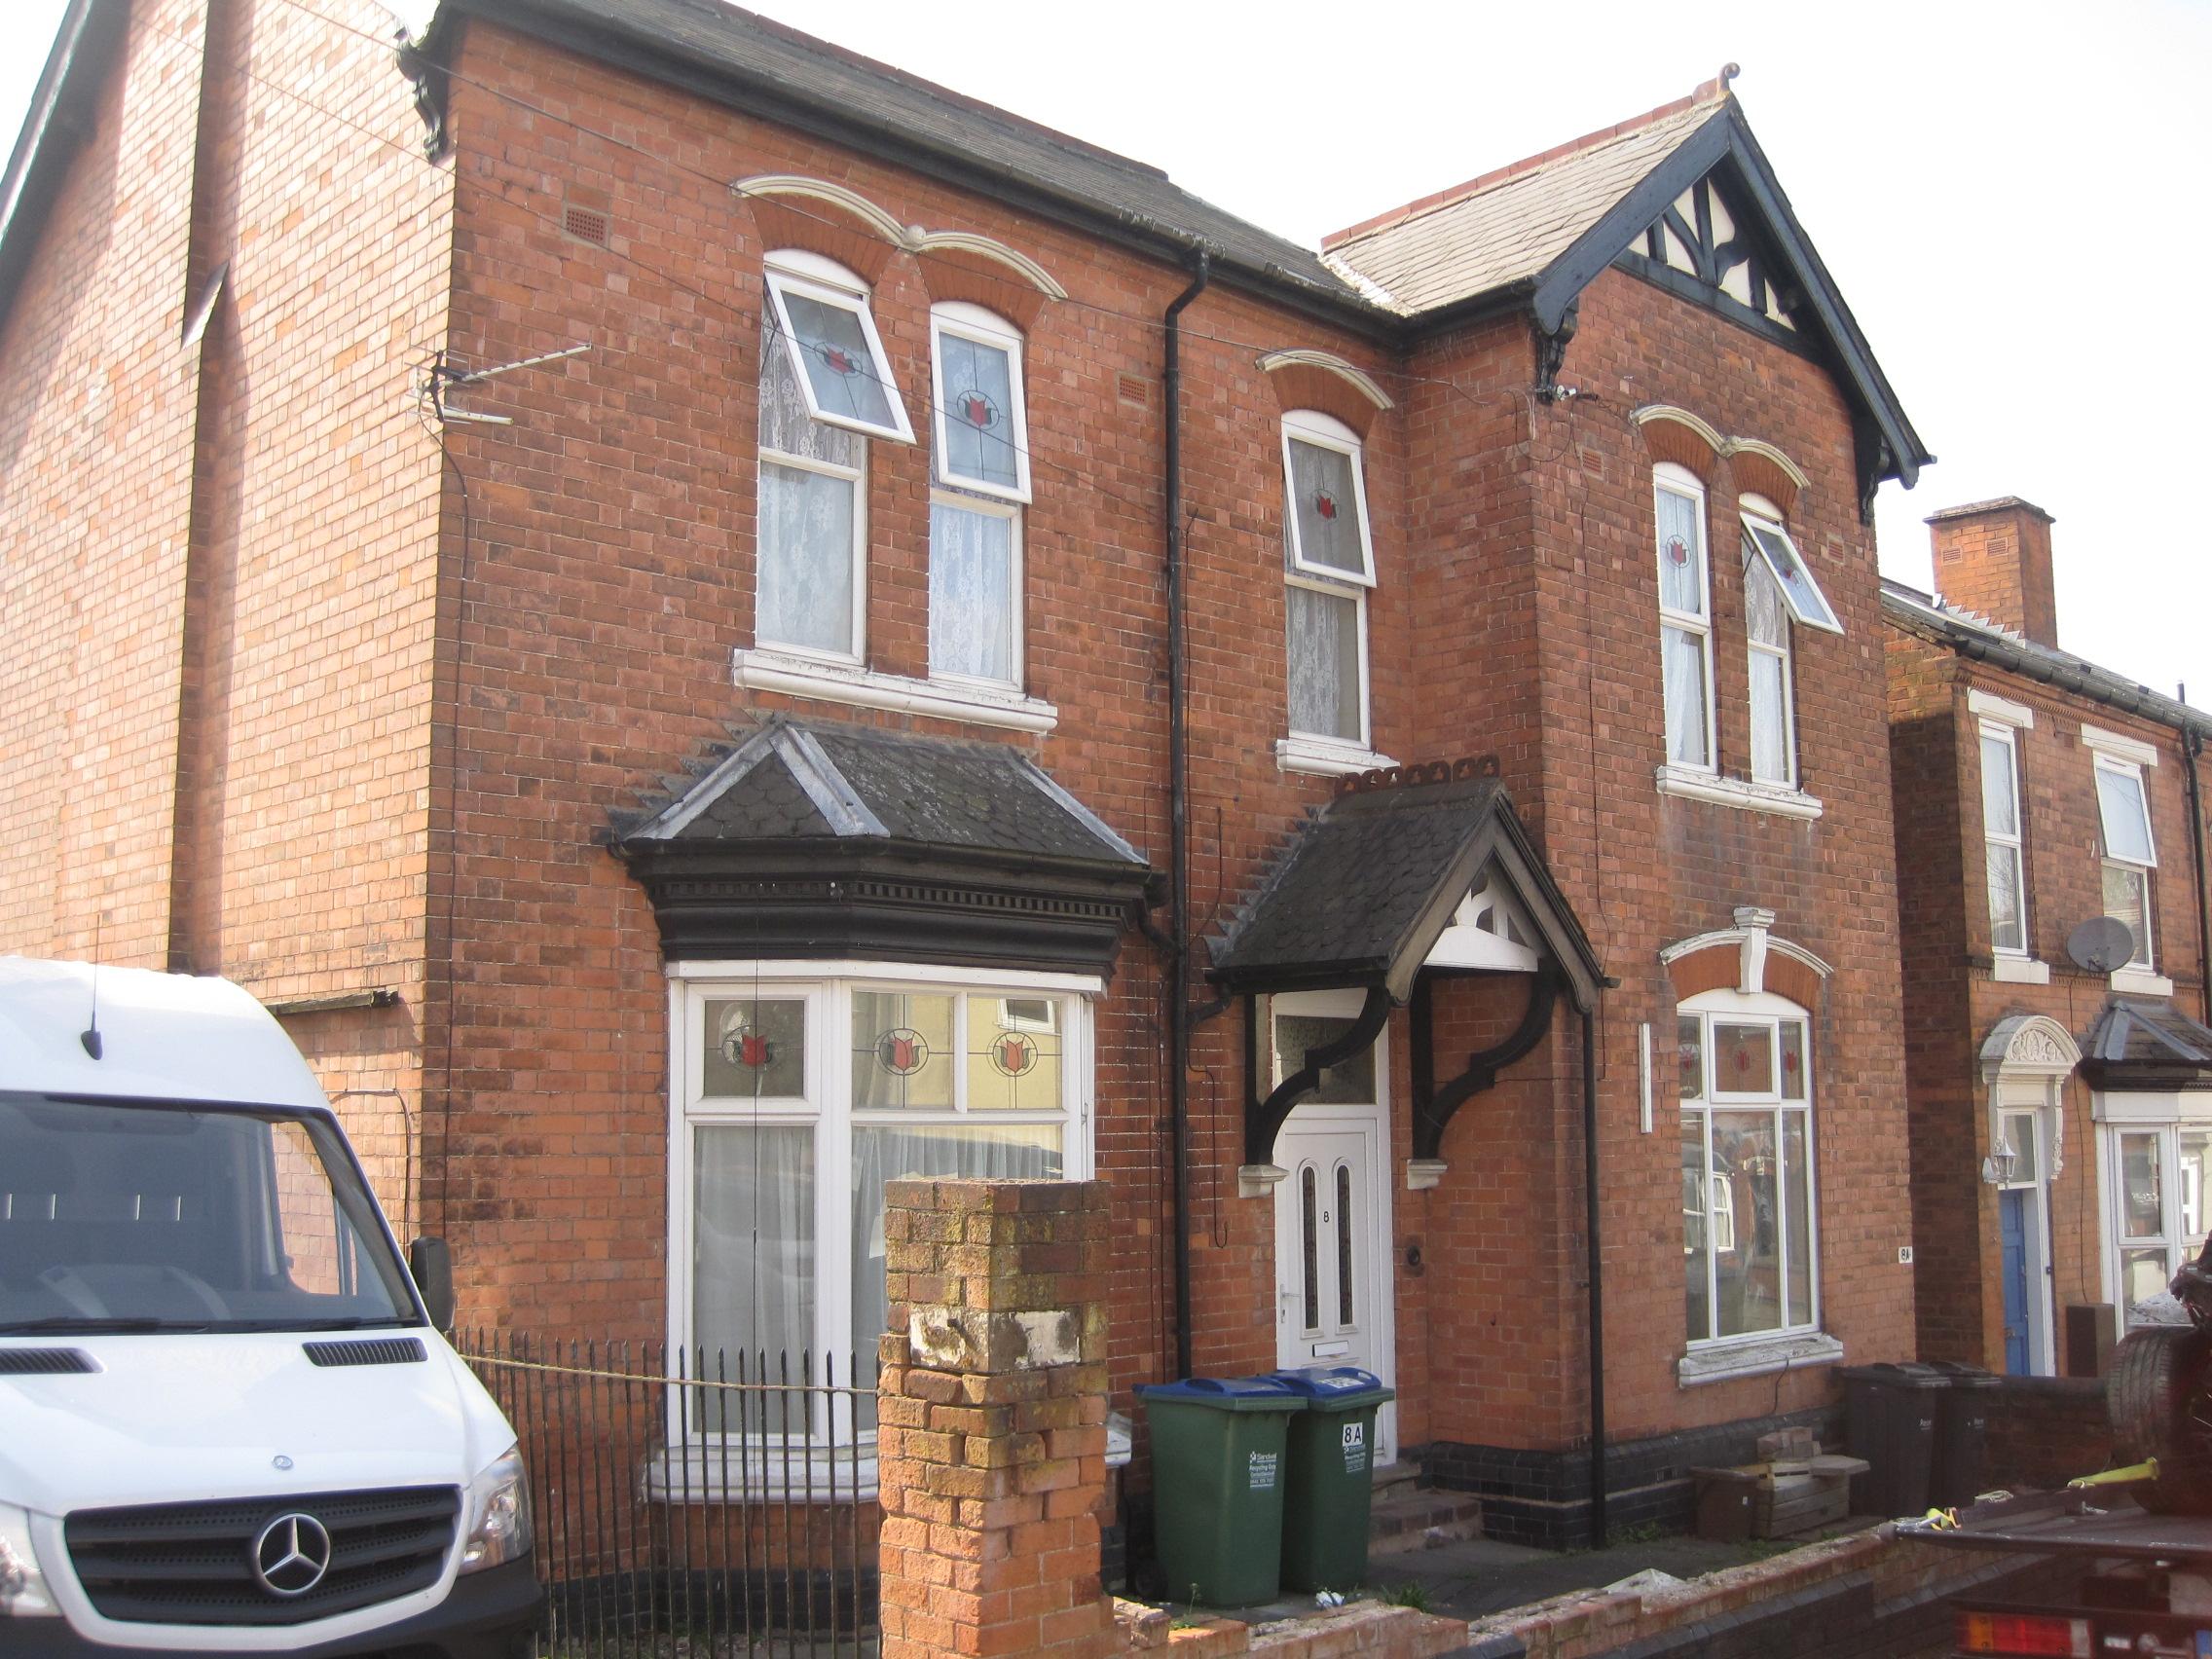 8a North street, Smethwick, B67 7DA